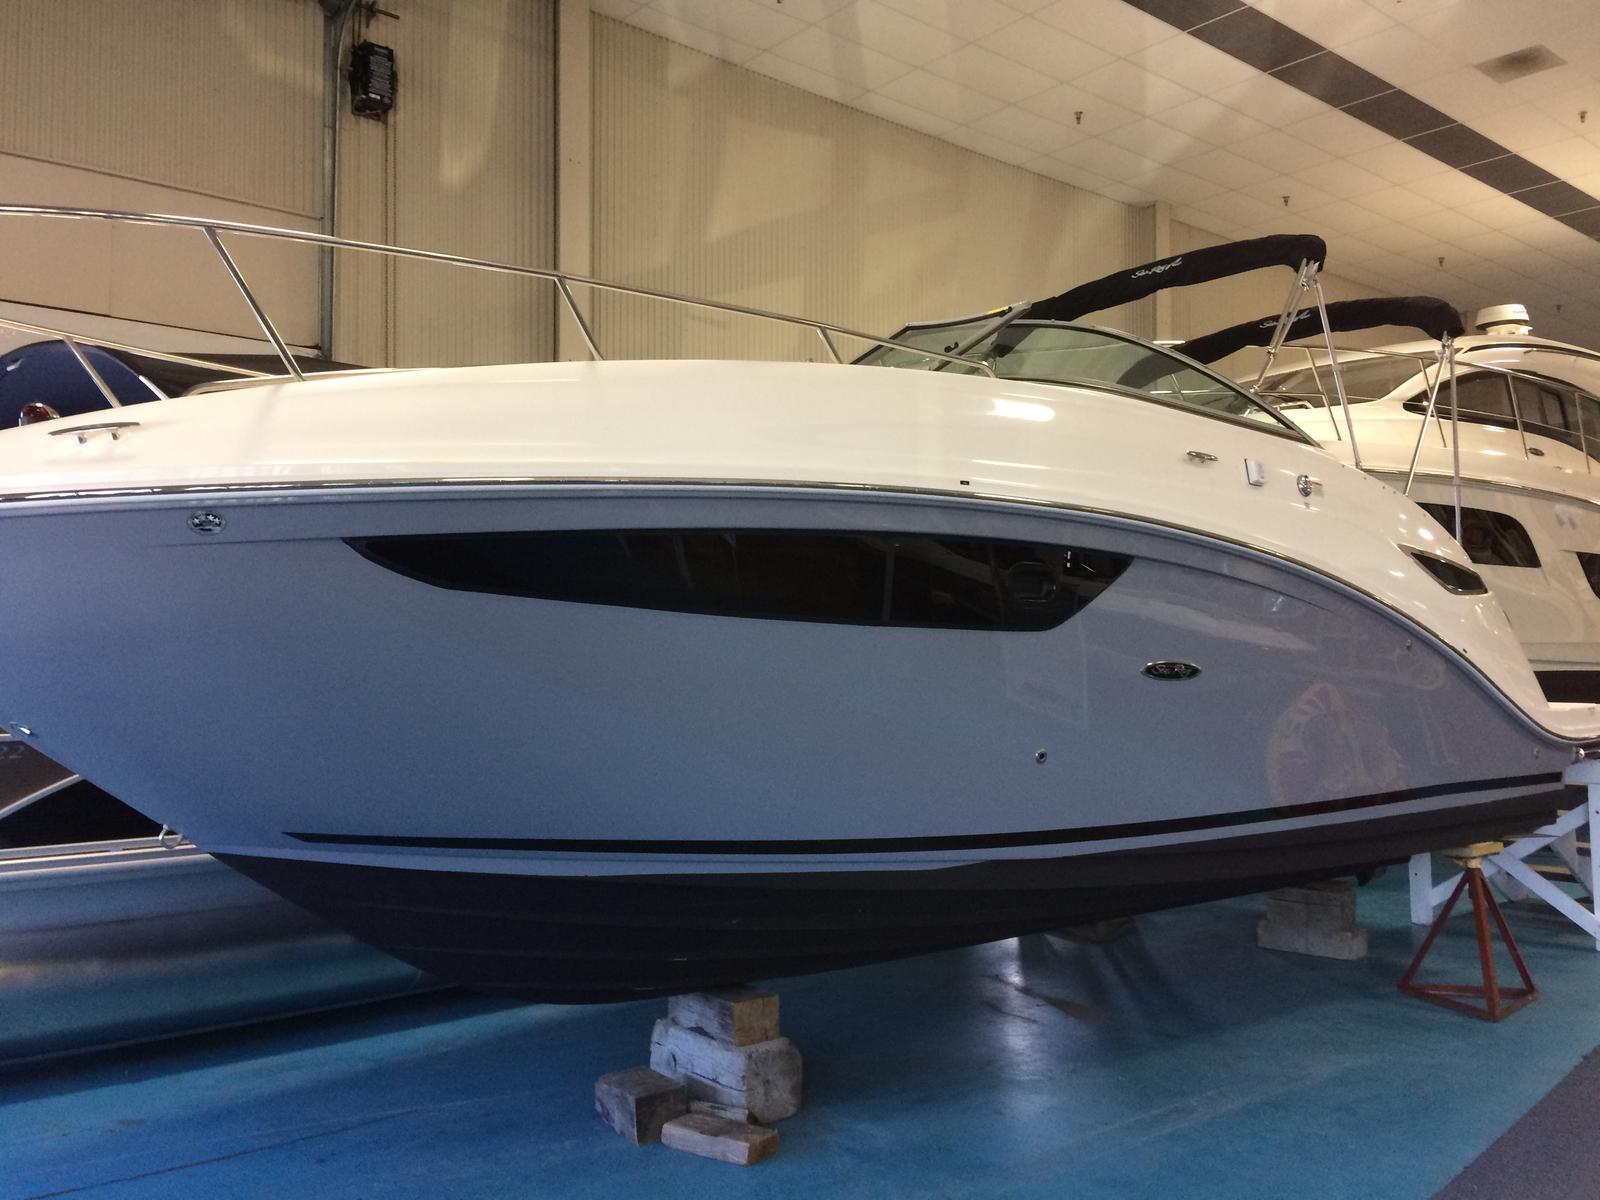 New 2017 Sea Ray Sundancer 260 - Hutchinson's Boat Works